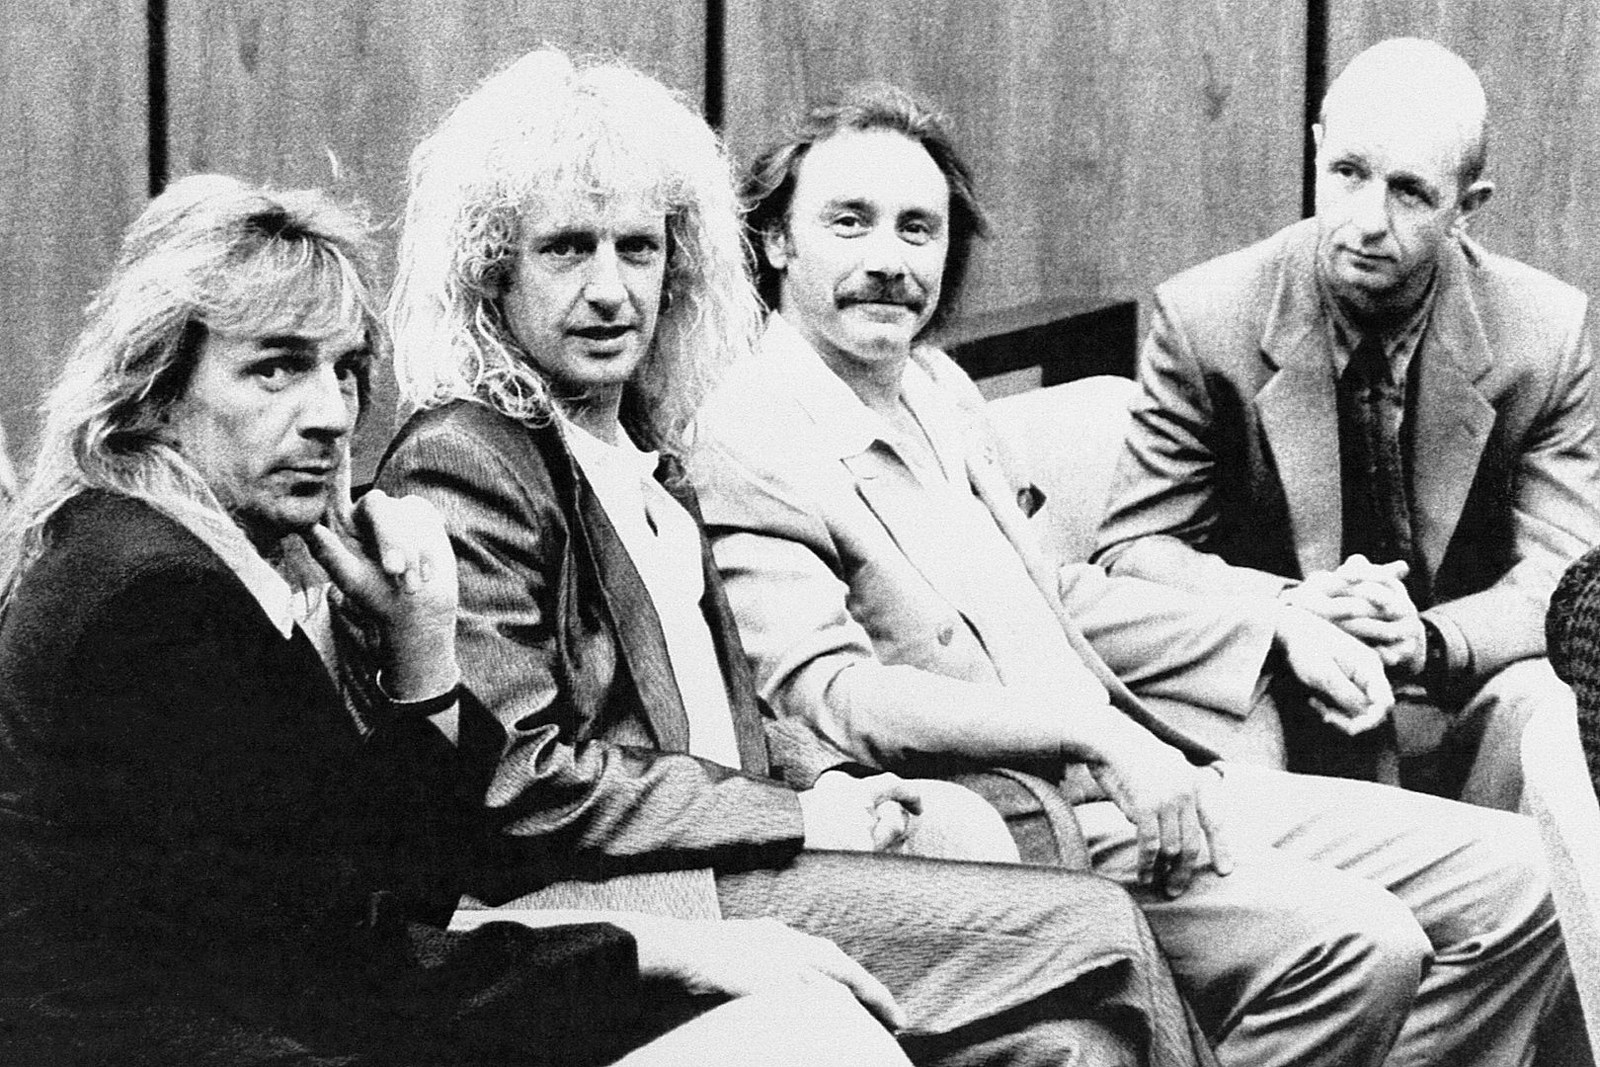 Judas Priest Didn't Celebrate Their Subliminal Message Court Win